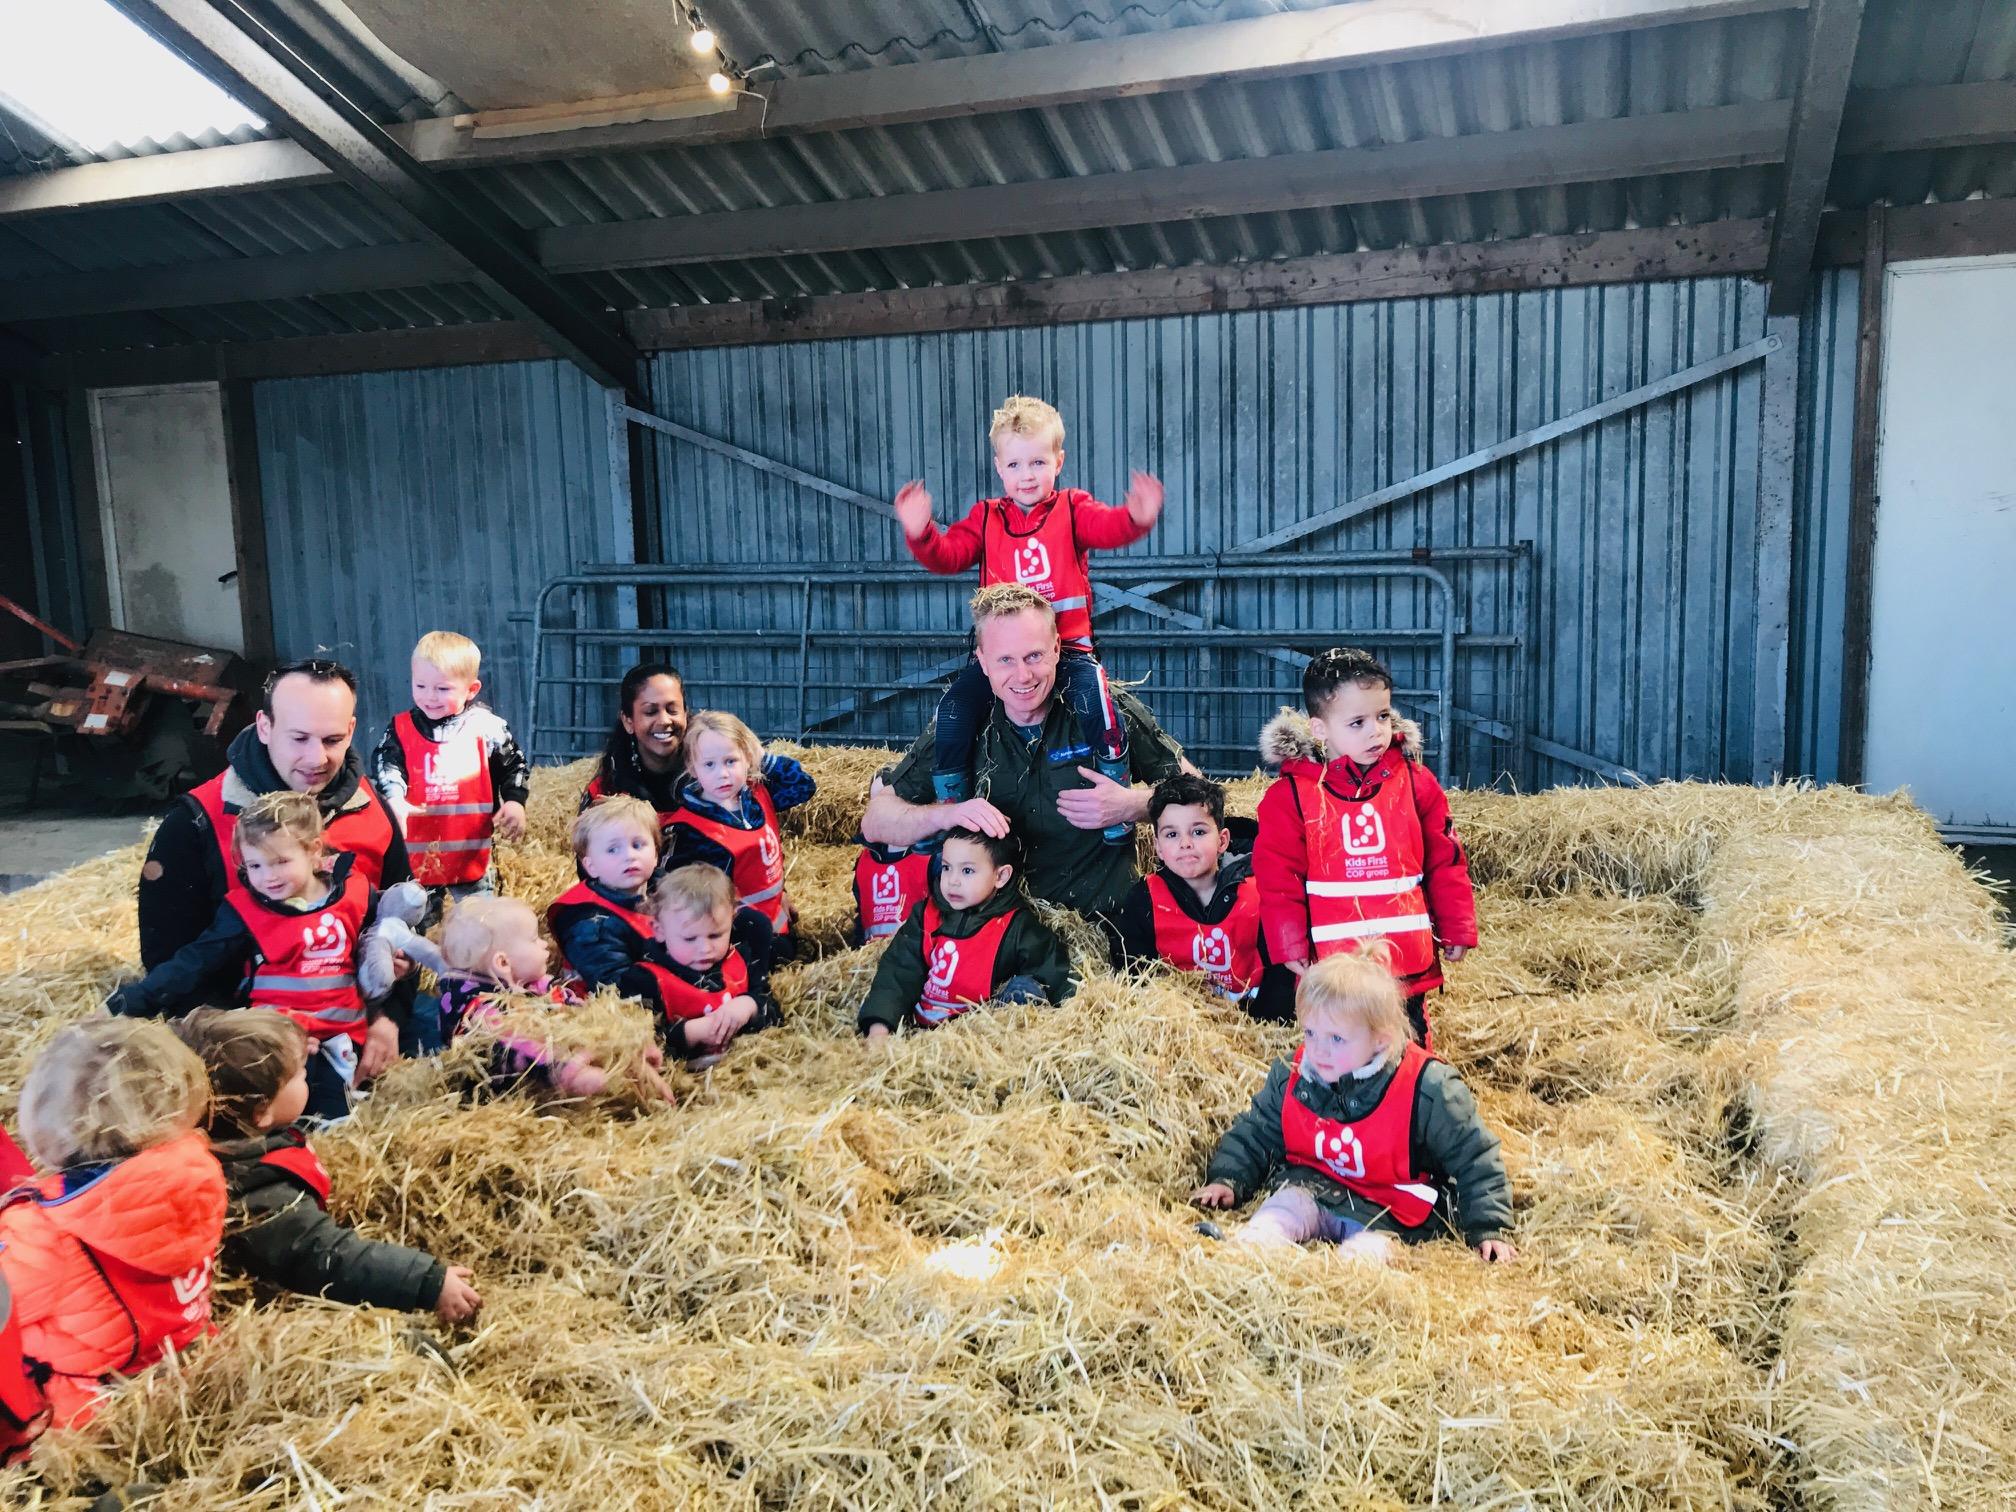 Kids First COP groep - Lammetjesdag 2019 met Boswachter Bart